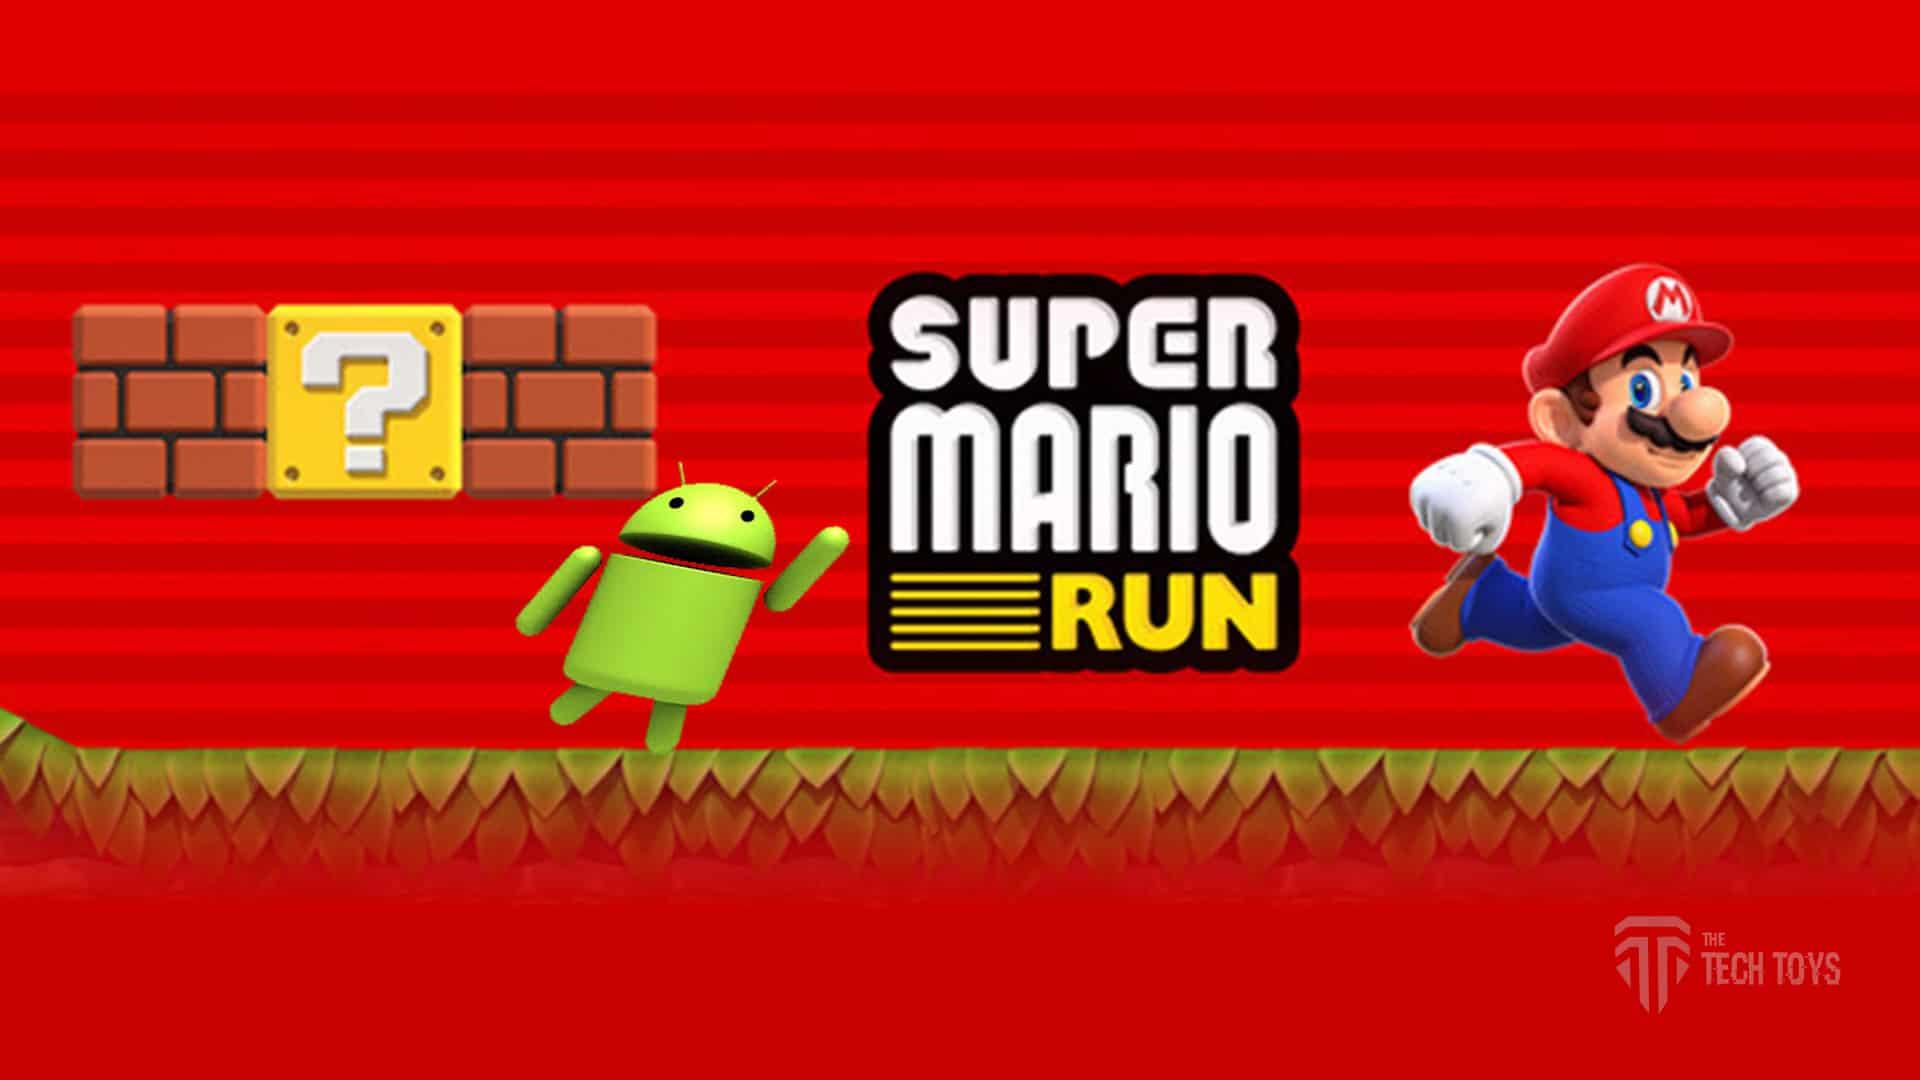 super mario run on Android